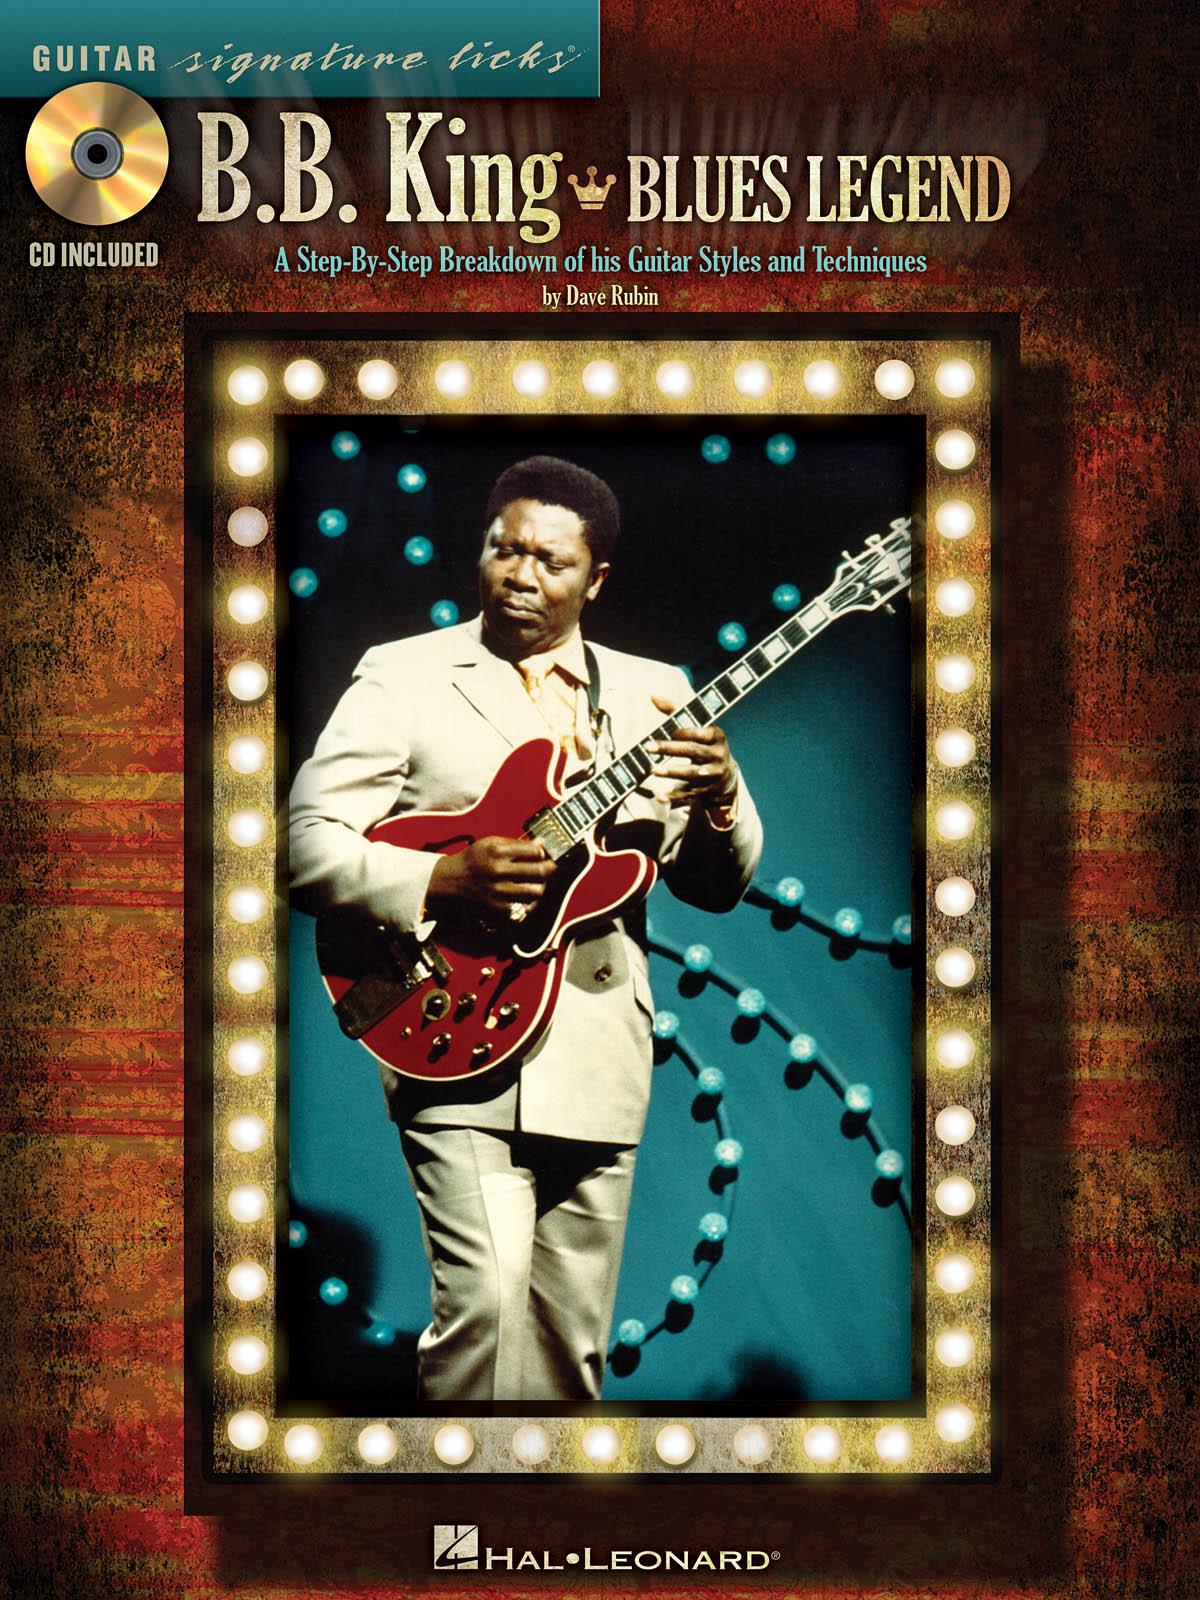 B.B. King - BLUES LEGENDA Step-by-Step